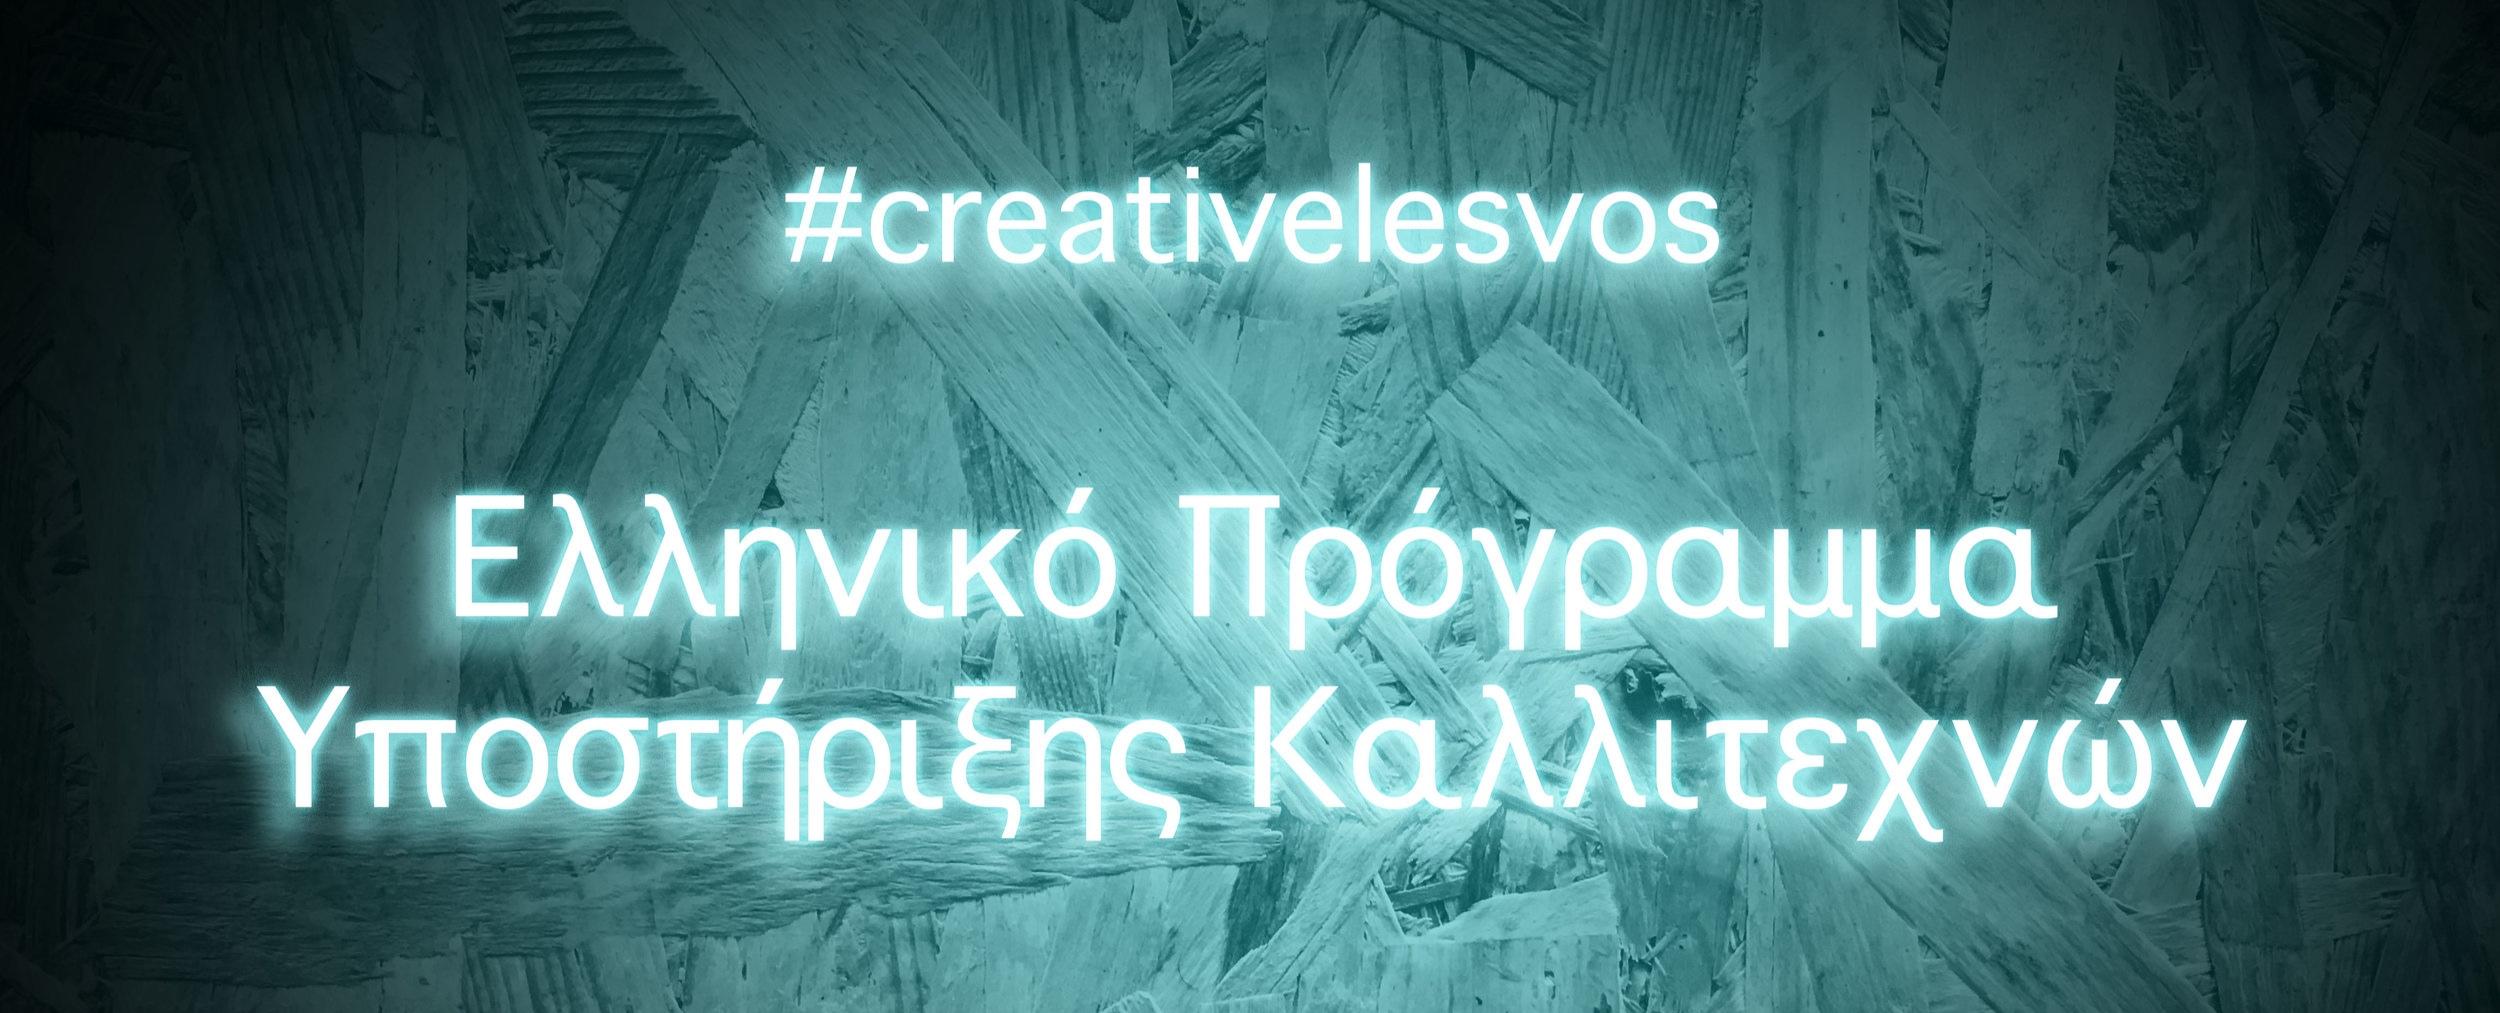 creative+lesvos+coming+soon.jpg